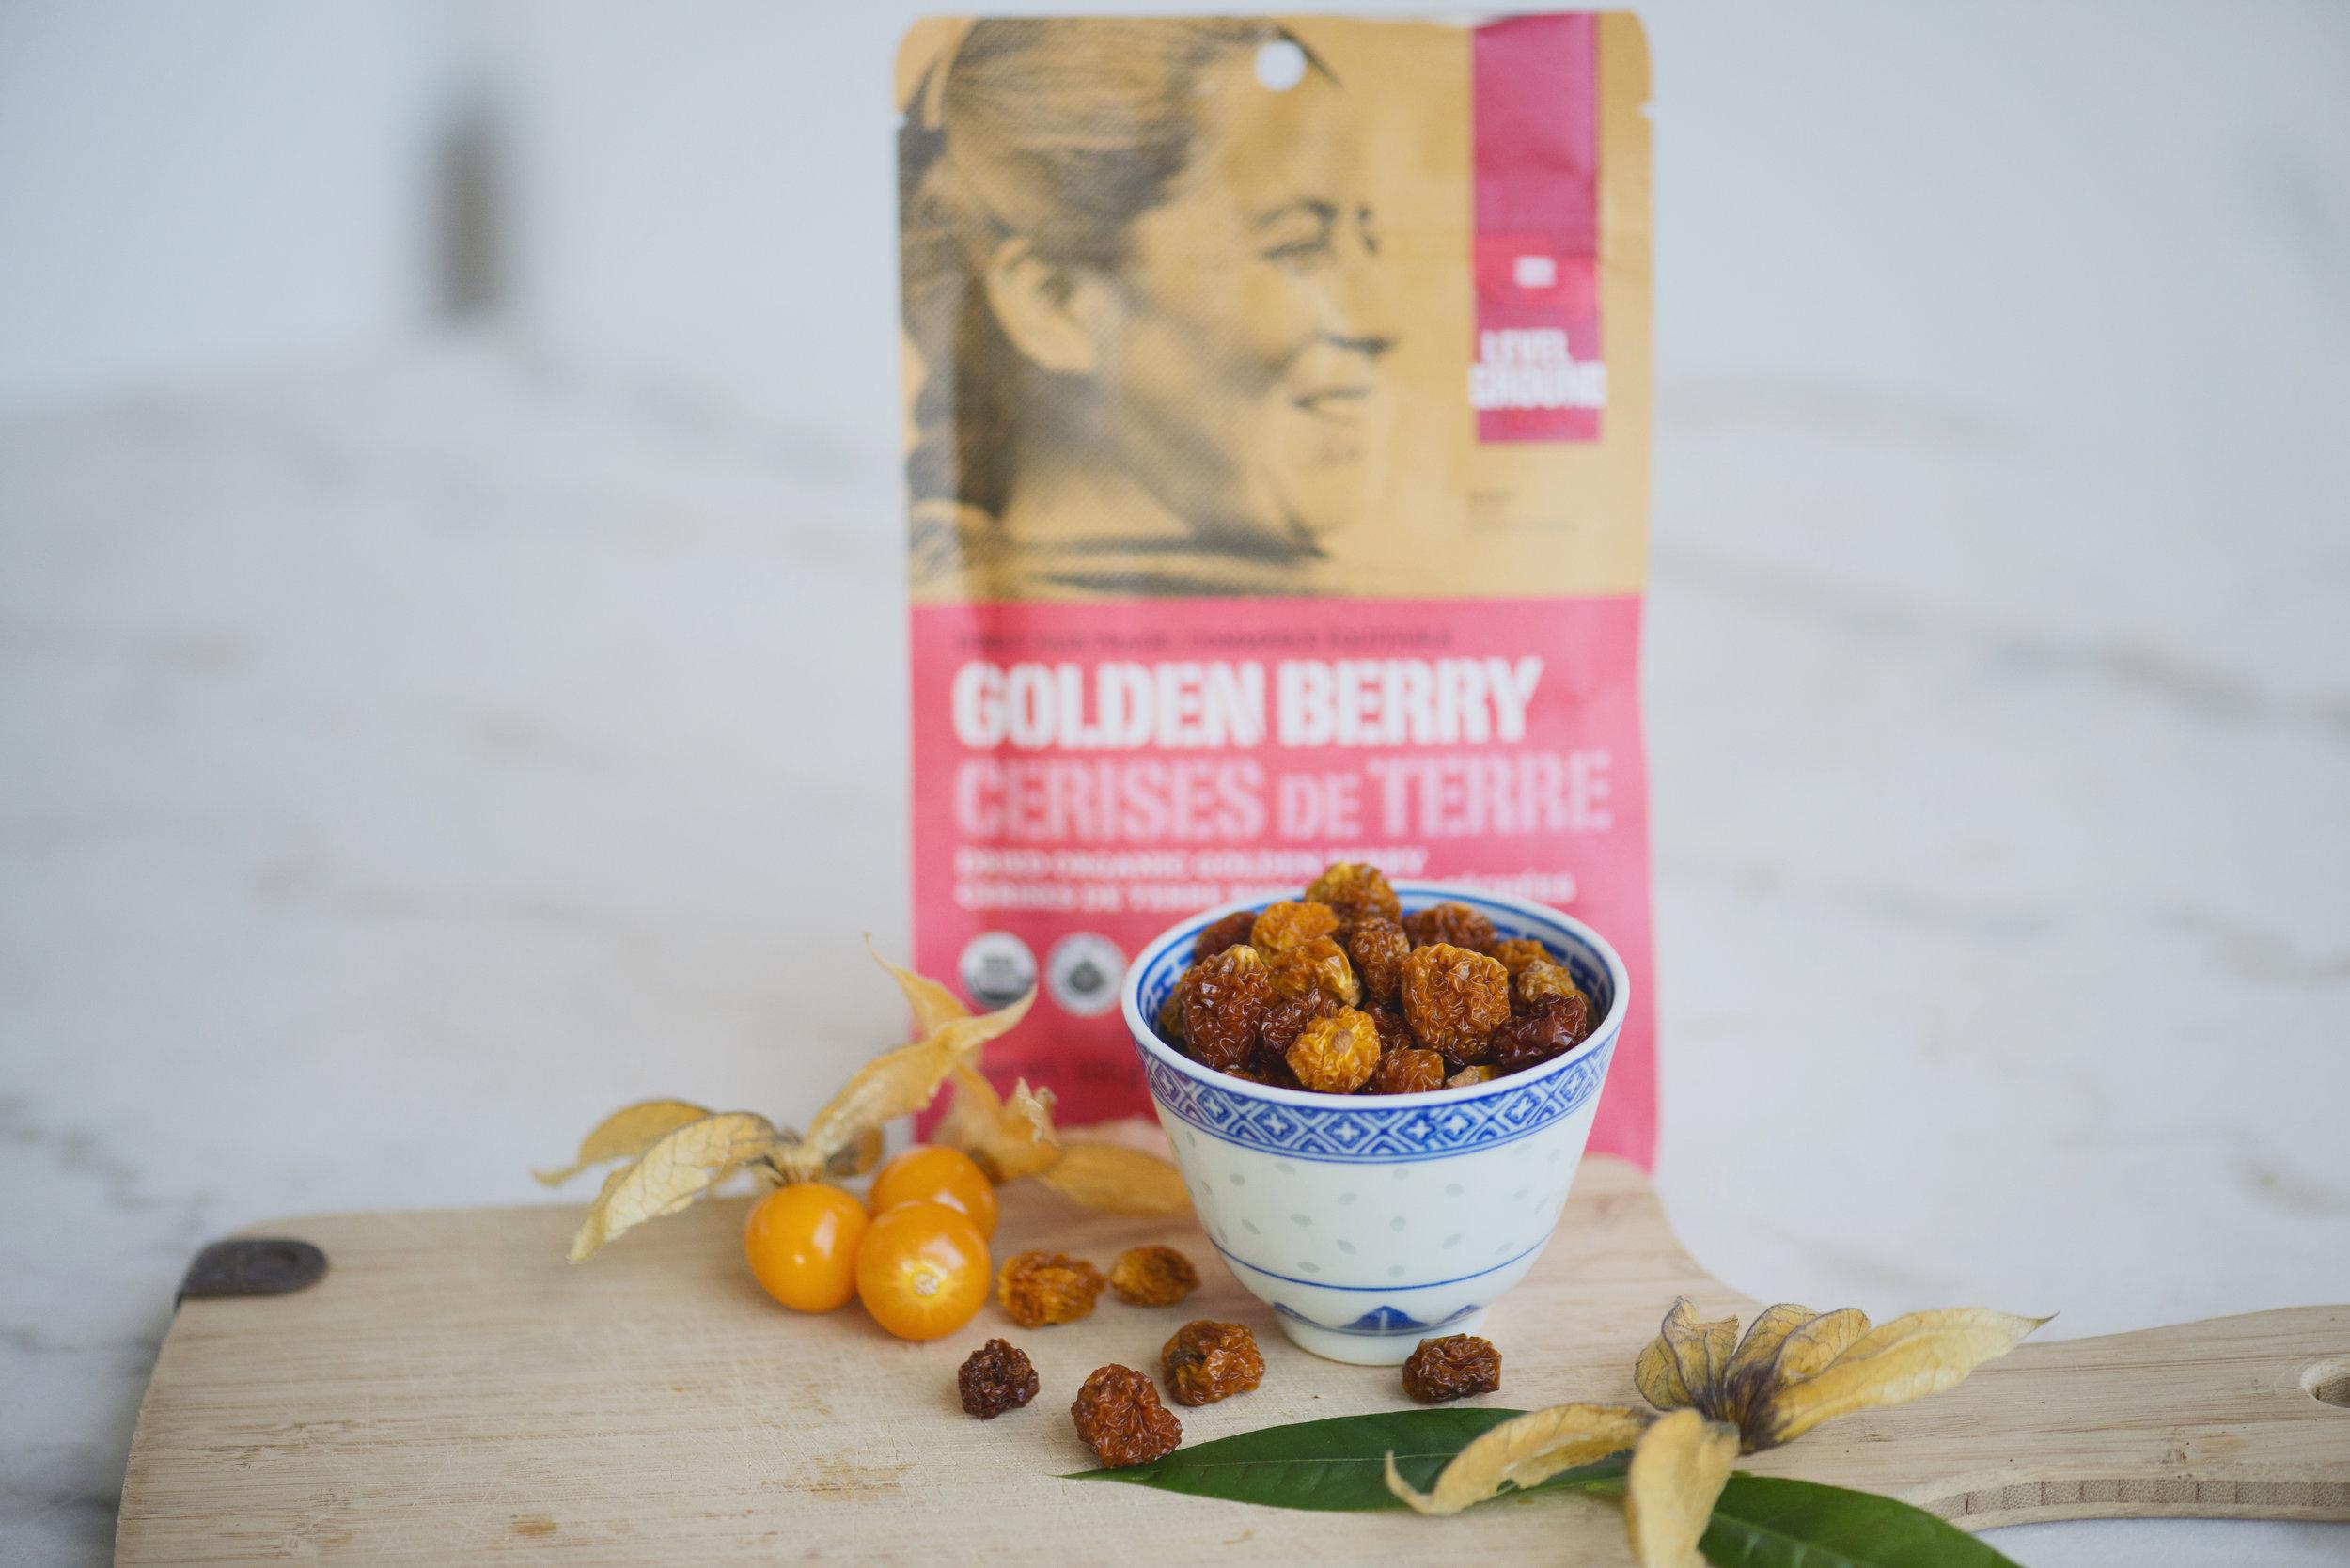 Golden Berry Package